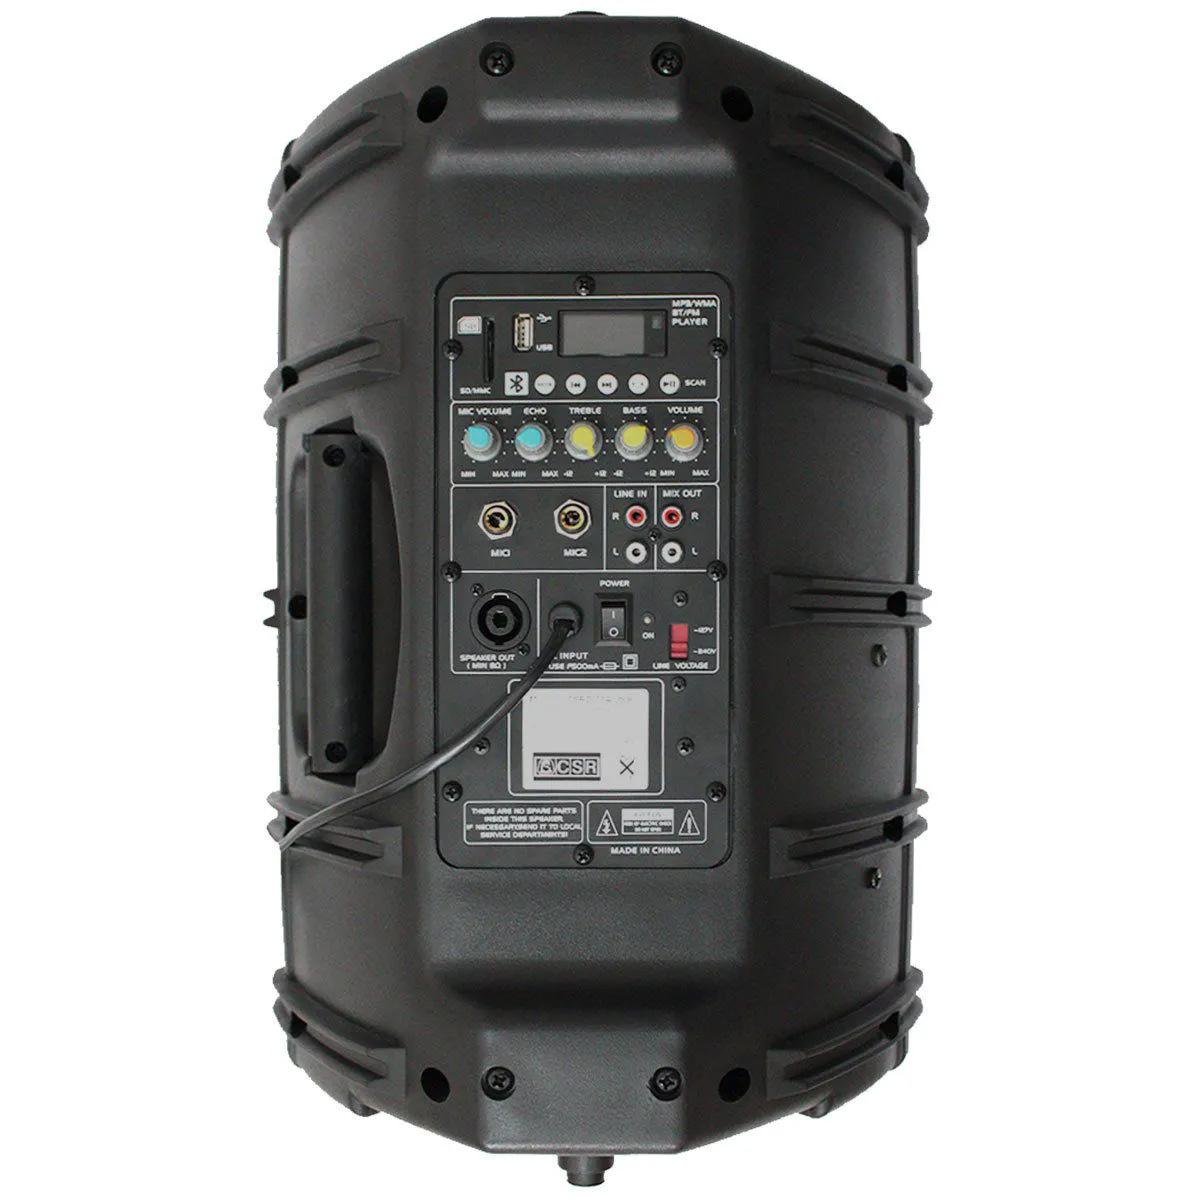 Caixa Ativa CSR 2500AUSB + Microfone sem Fio TSI X1UHF